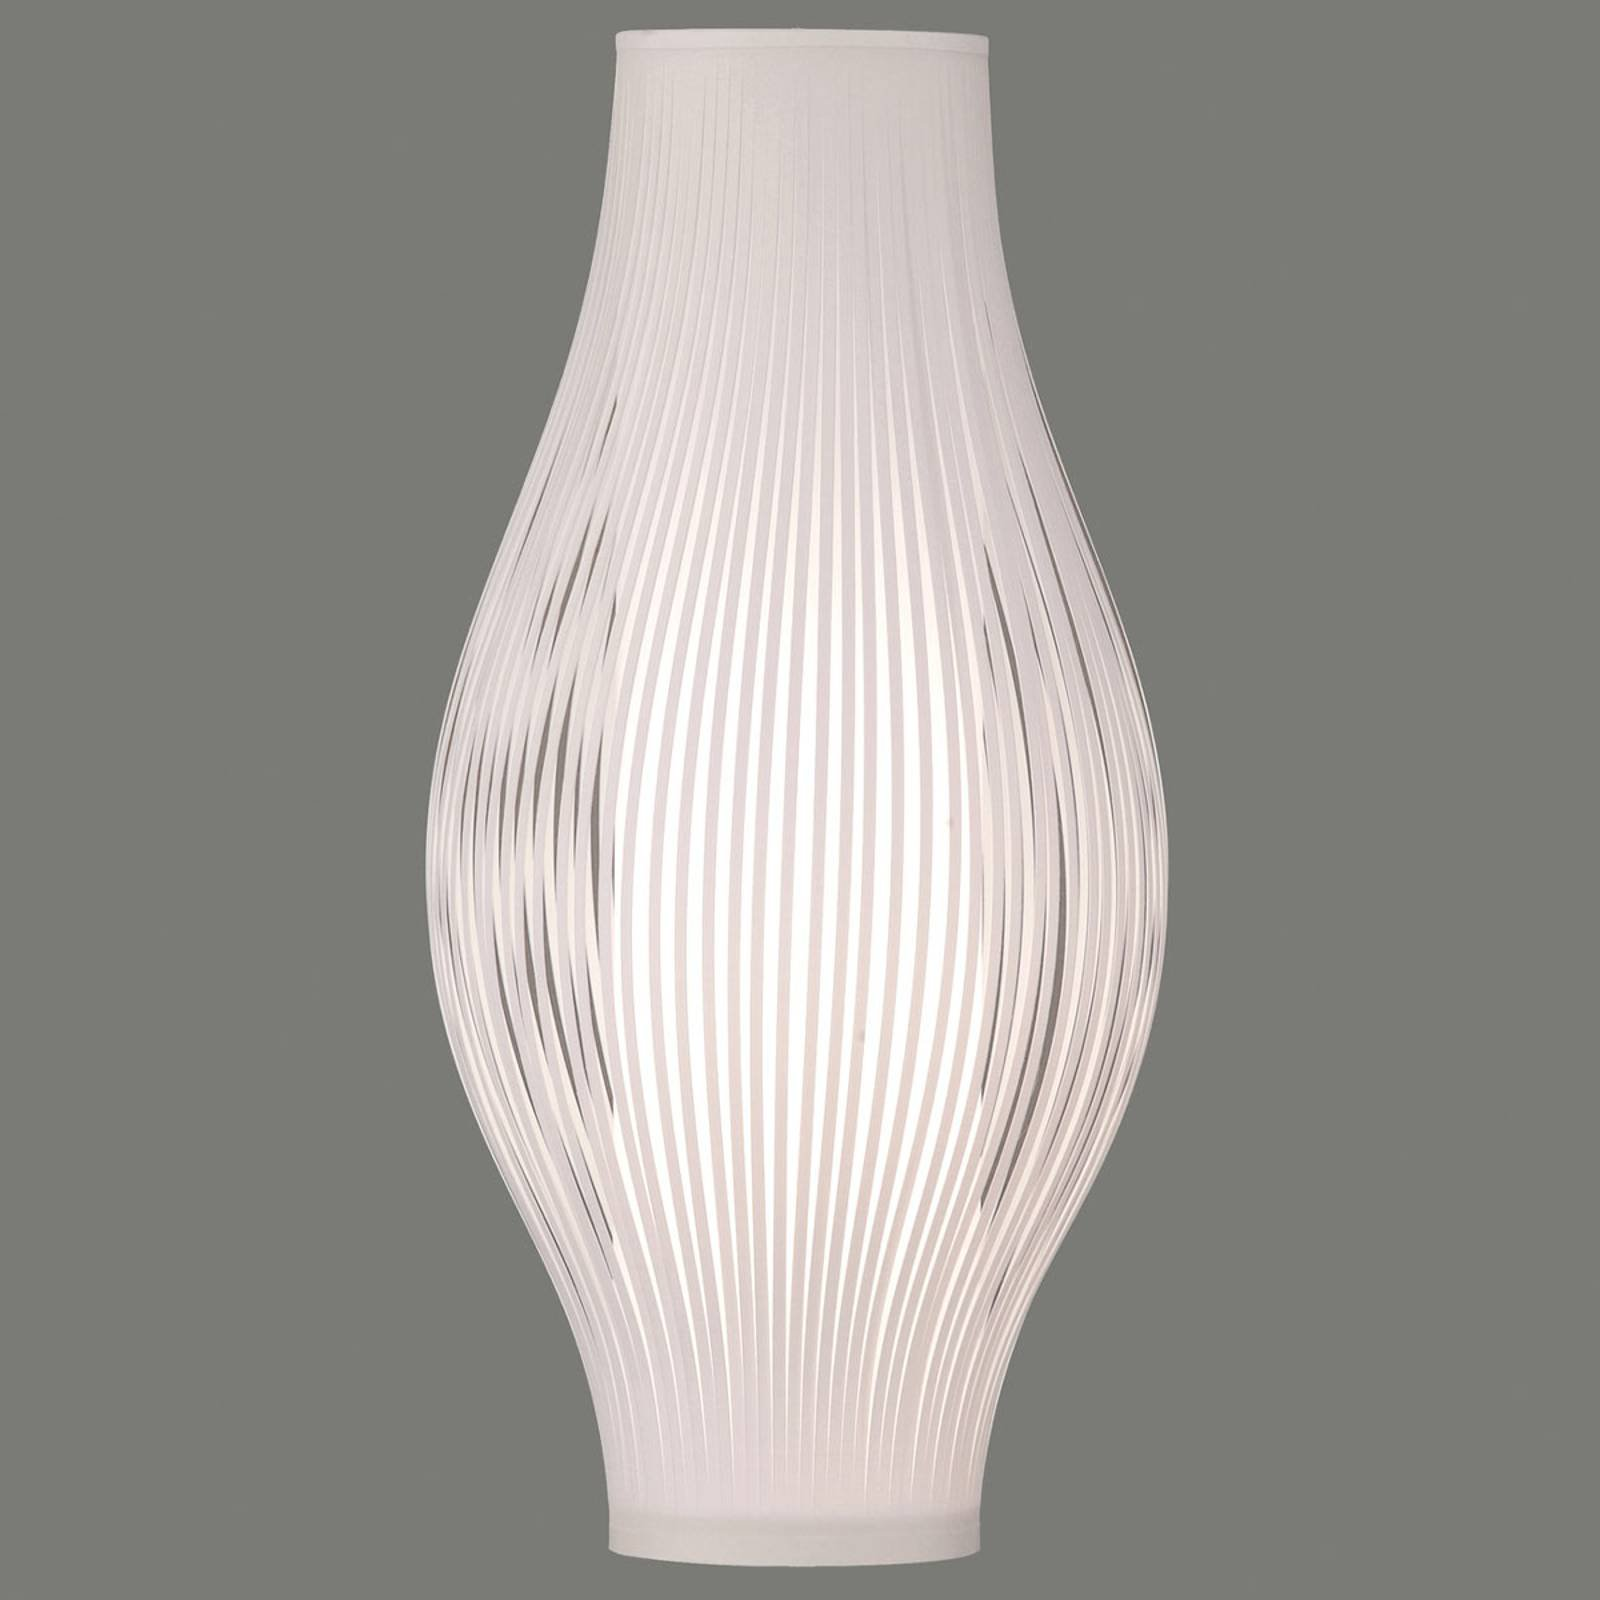 Bordlampe Murta, 71 cm, hvit